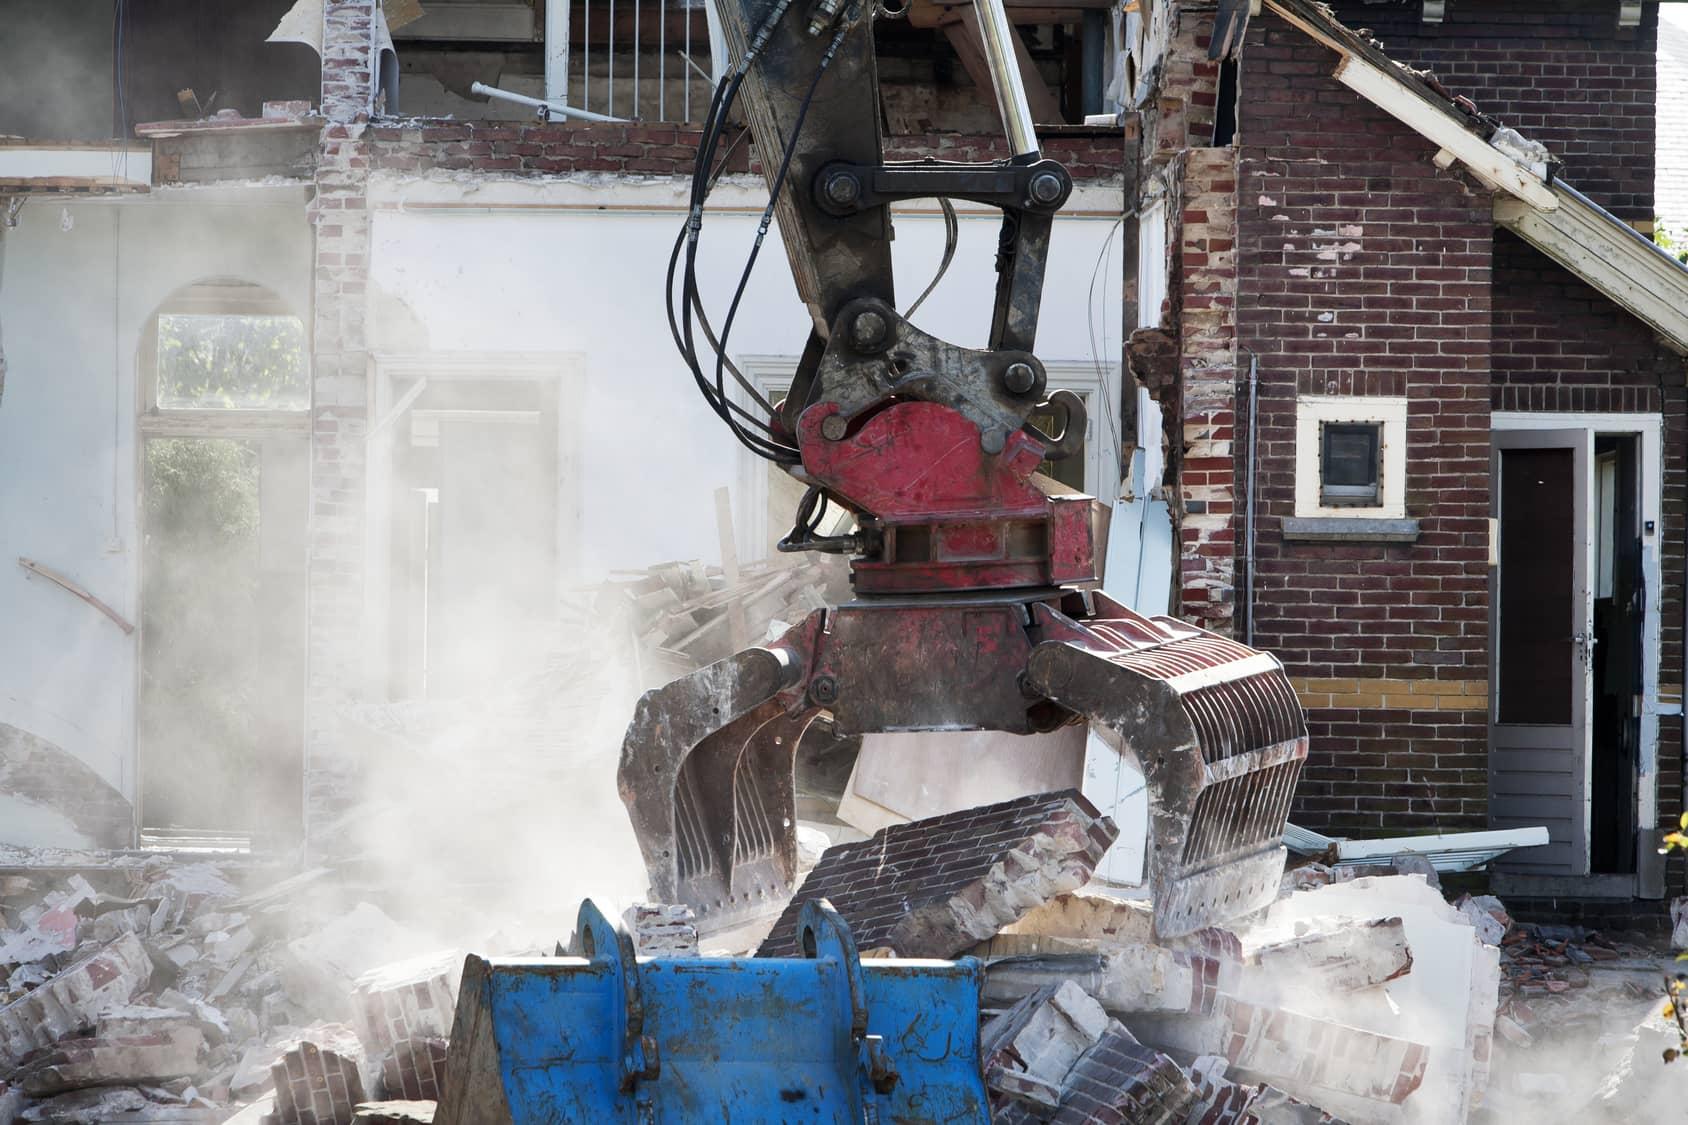 Demolishing an abandoned house with a grab